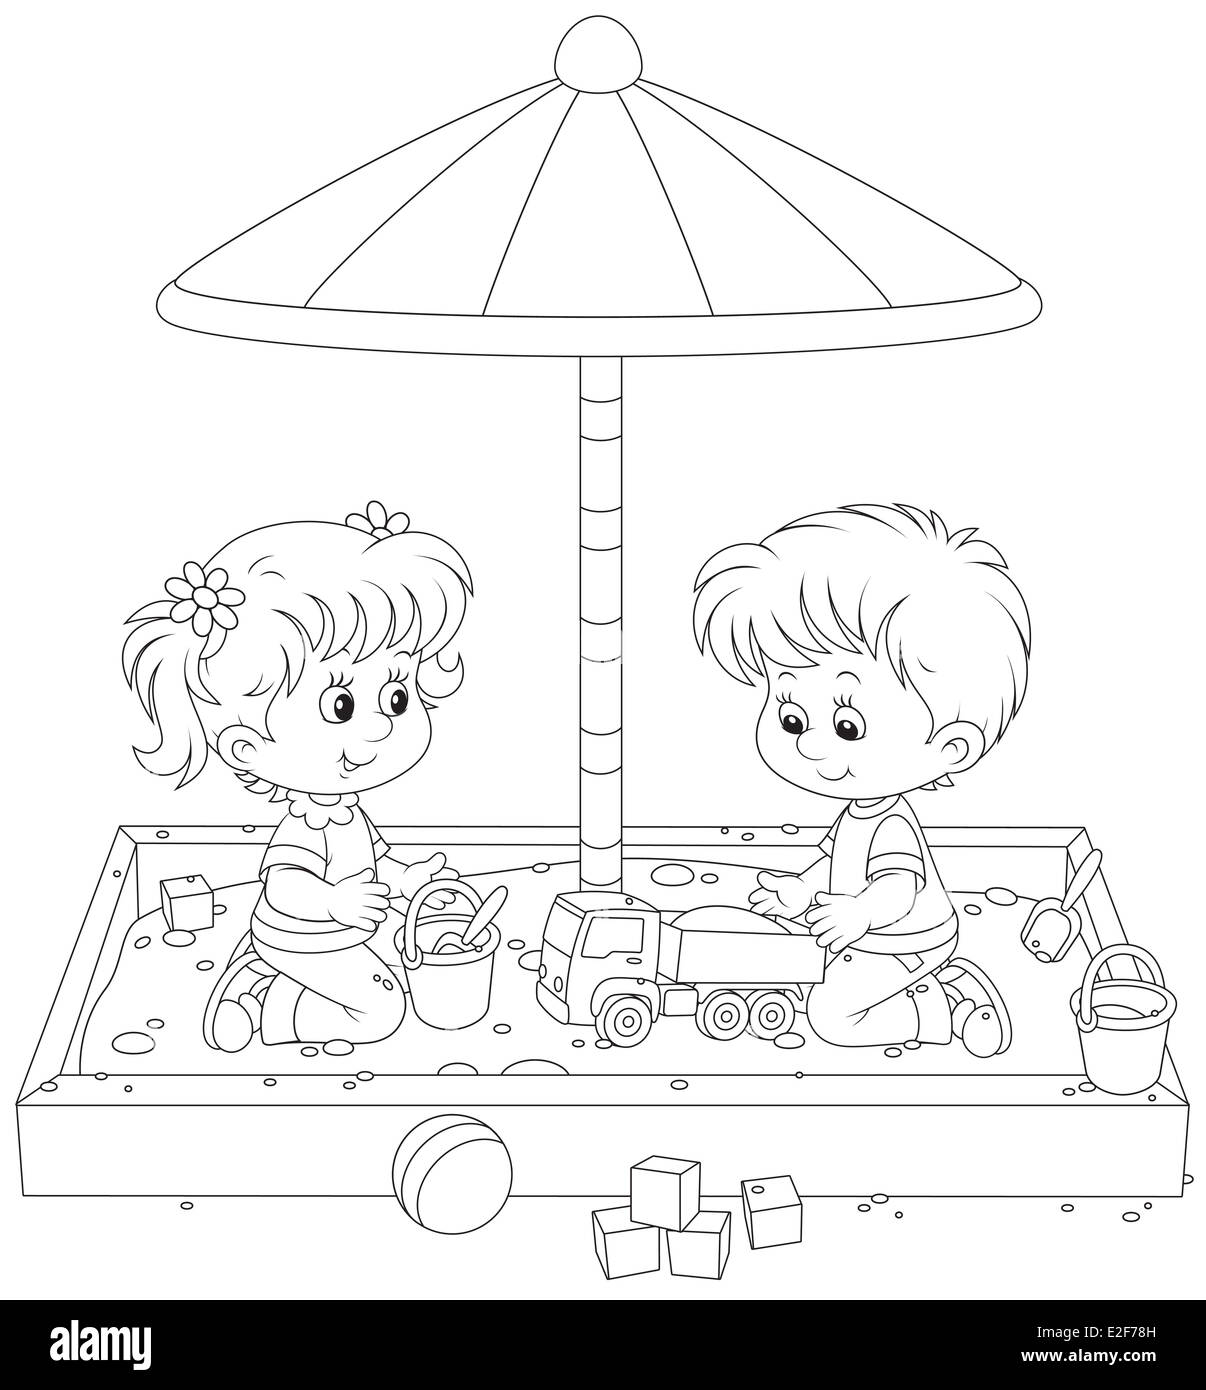 Children play in a sandbox - Stock Image